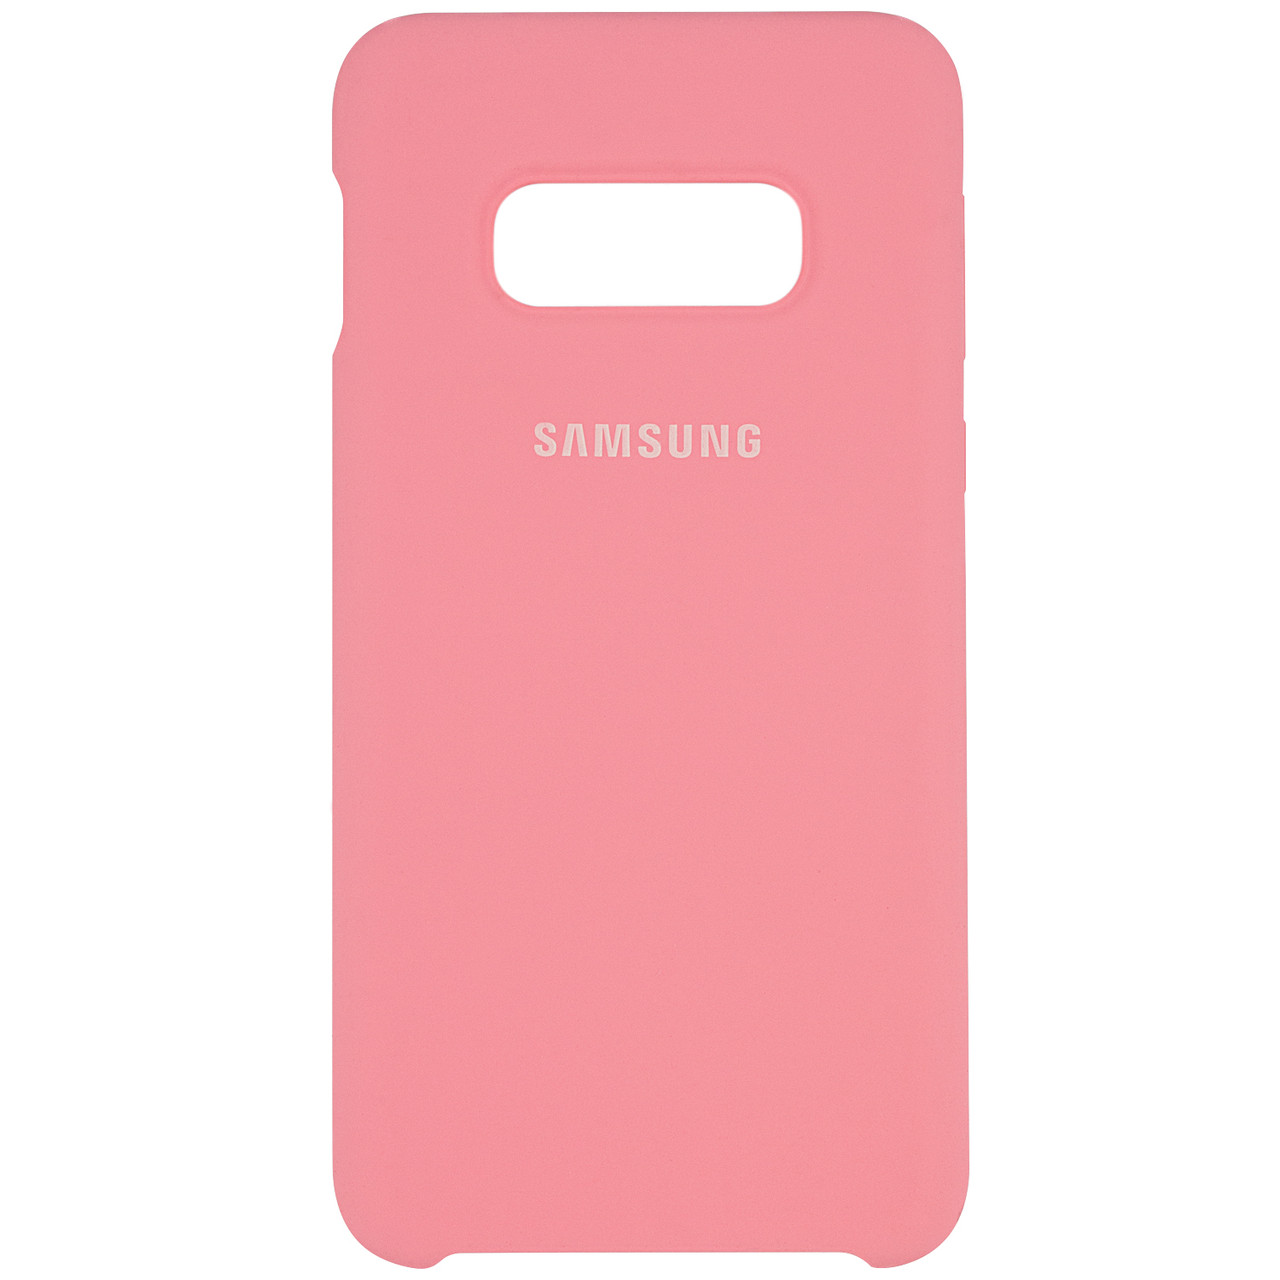 Чехол Silicone case для Samsung Galaxy S10e